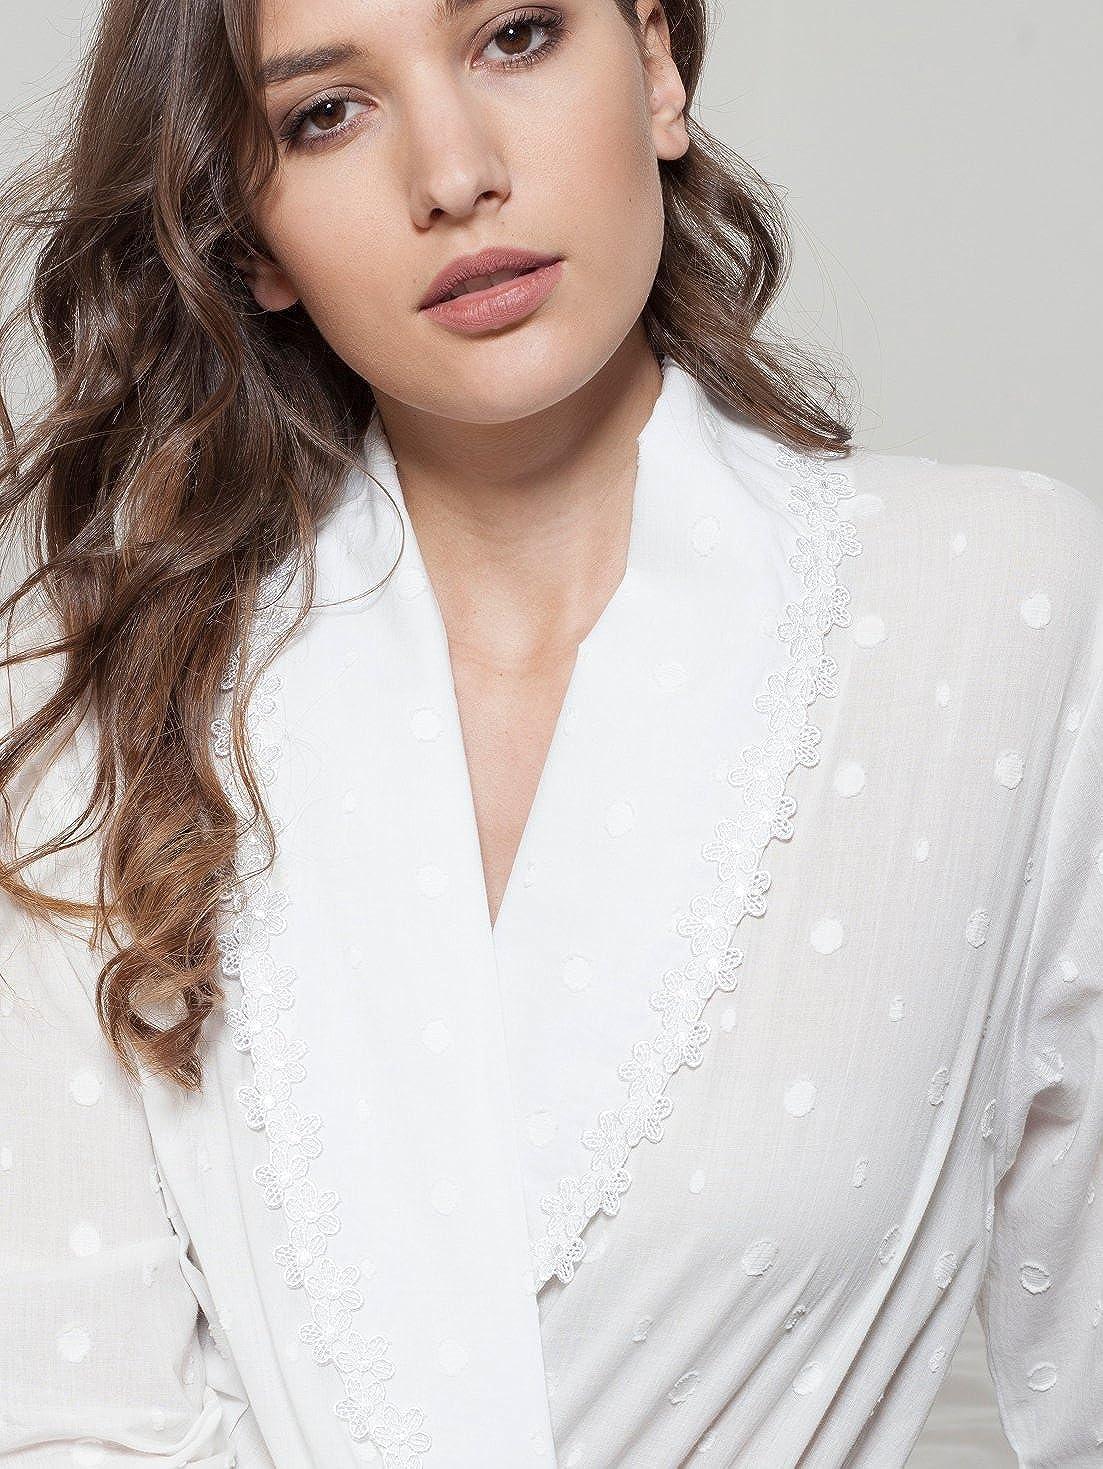 Cottonreal  Noah  100% Cotton Voile Ivory Polka Dot Robe (Size XS-XXL)   Amazon.co.uk  Clothing b2e326127